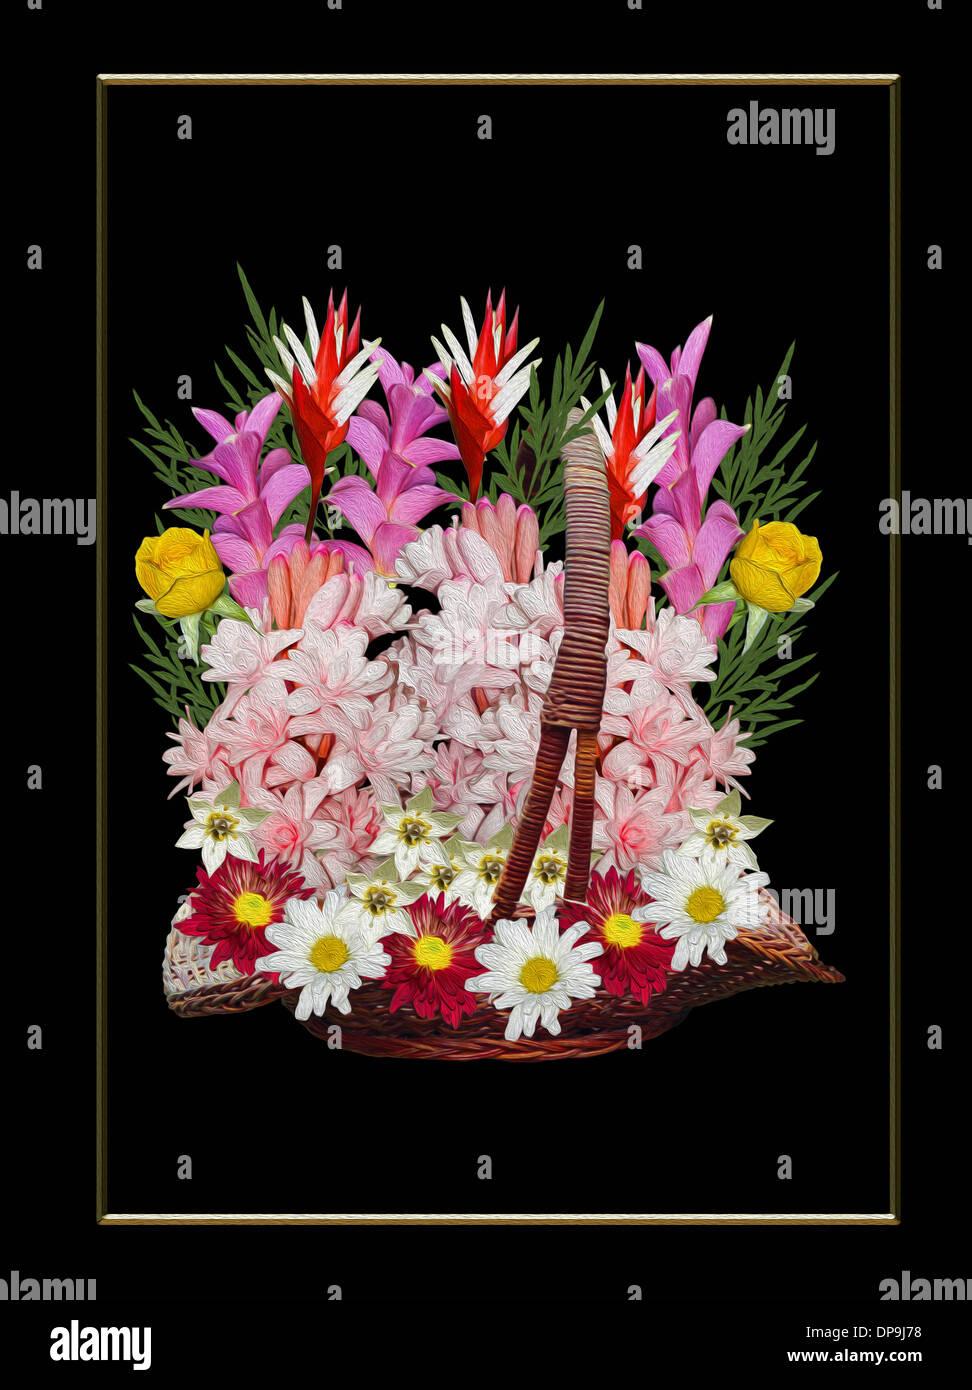 Colourful daisy like flowers choice image flower wallpaper hd colourful daisy like flowers images flower wallpaper hd colourful daisy like flowers choice image flower wallpaper izmirmasajfo